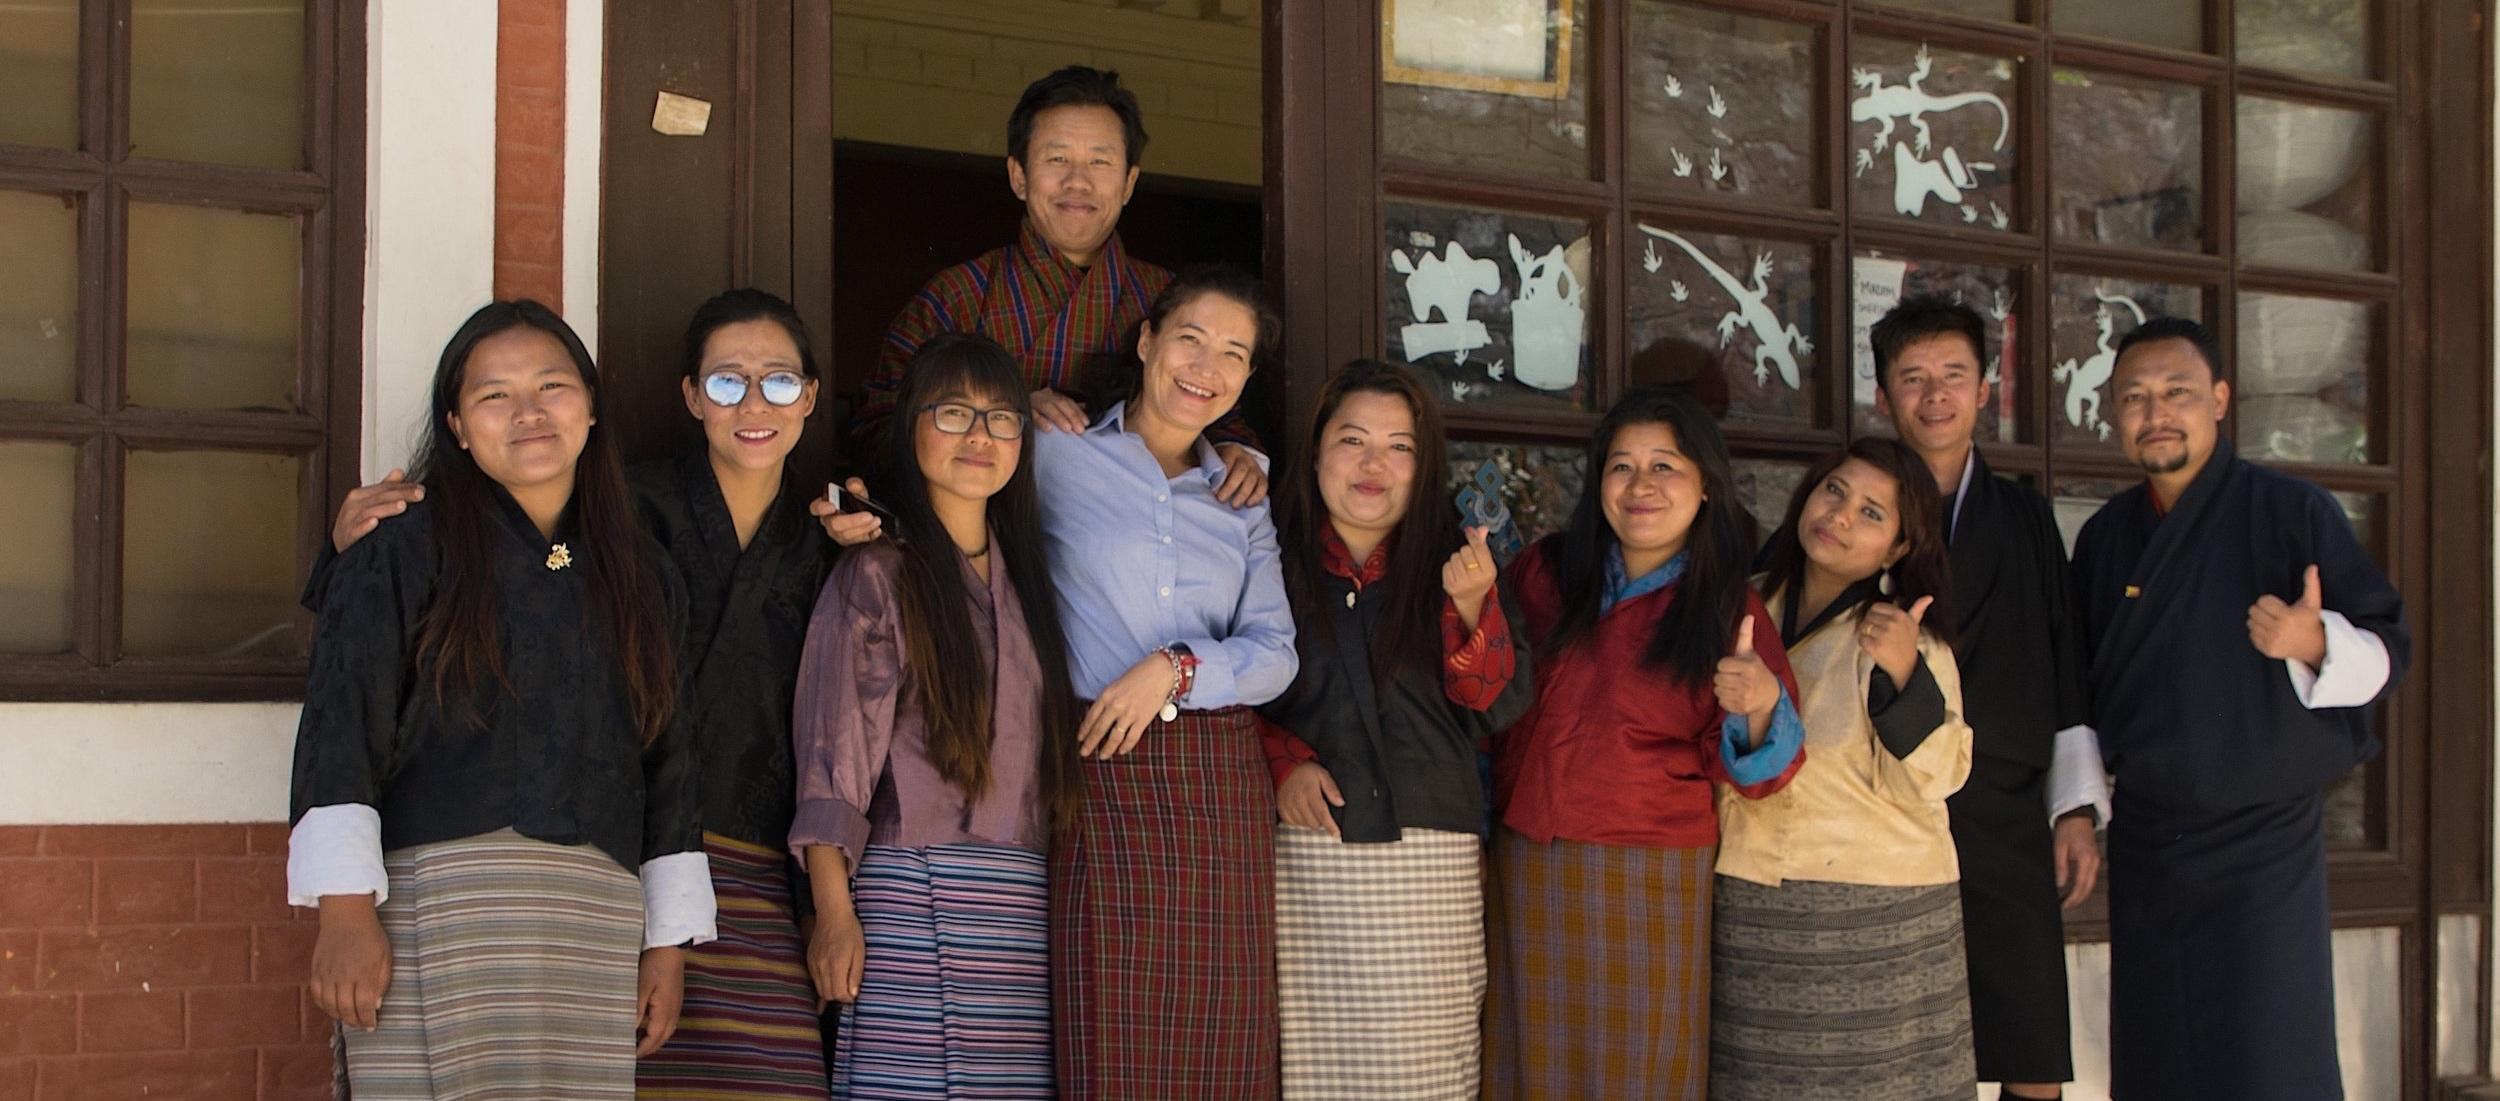 Bhutan_spicy_shangri-la.jpg